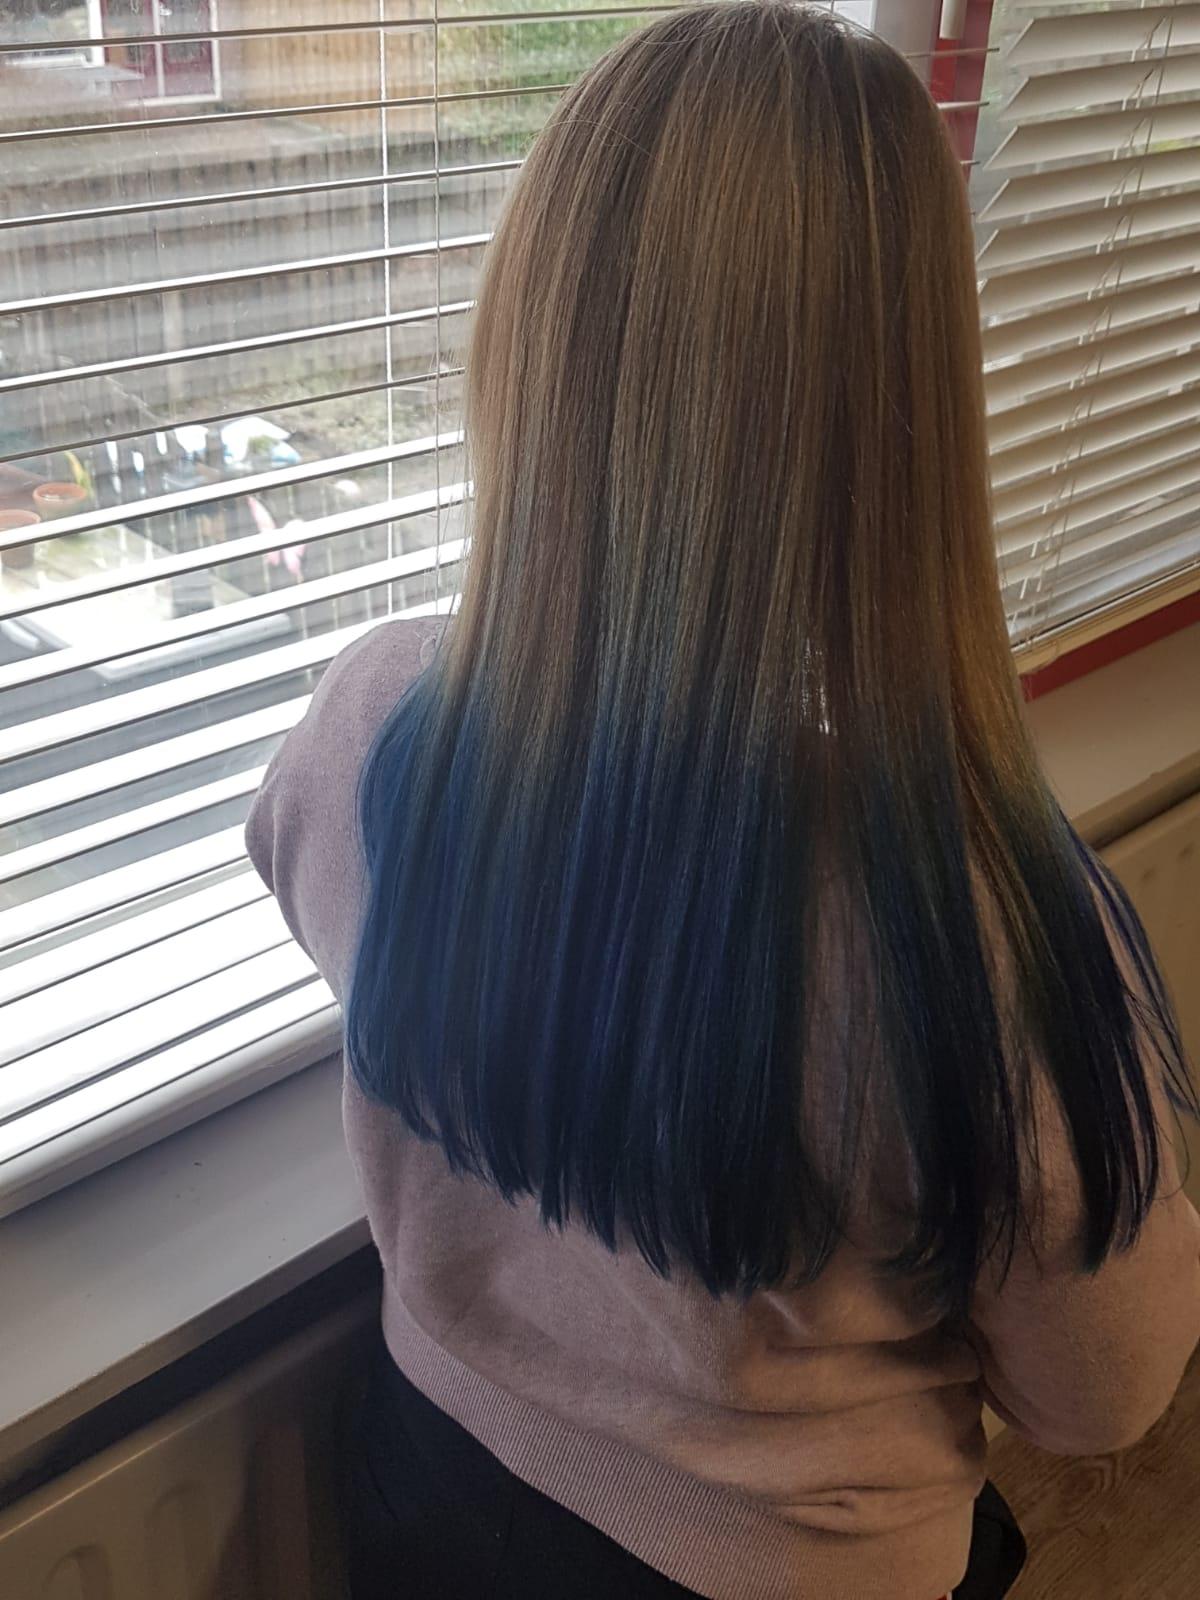 Blauw haar na